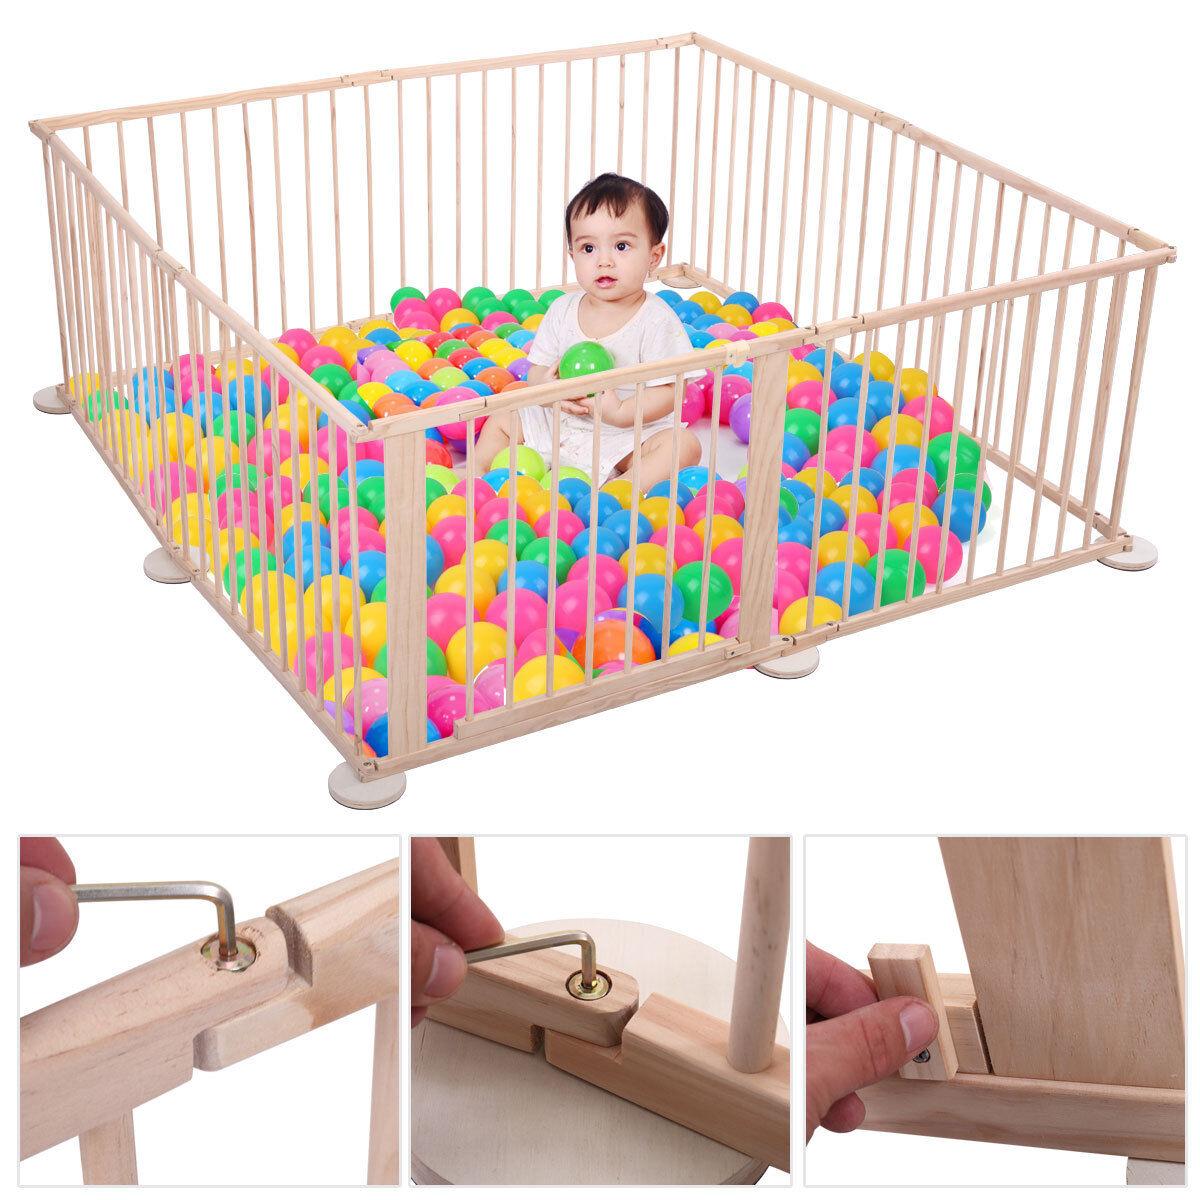 8 panel playpen foldable wooden